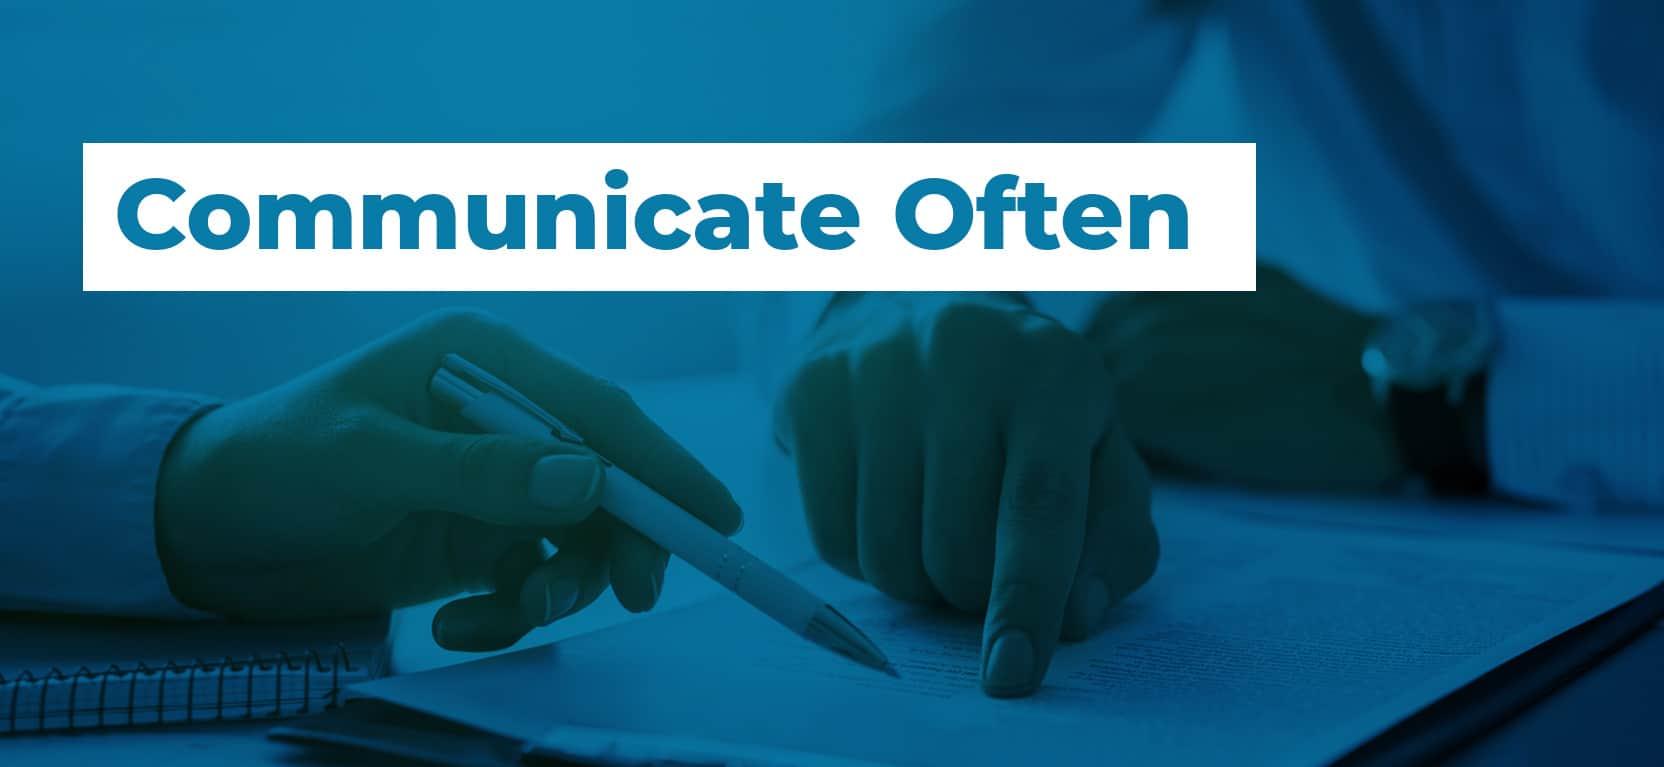 22 Communicate Often2